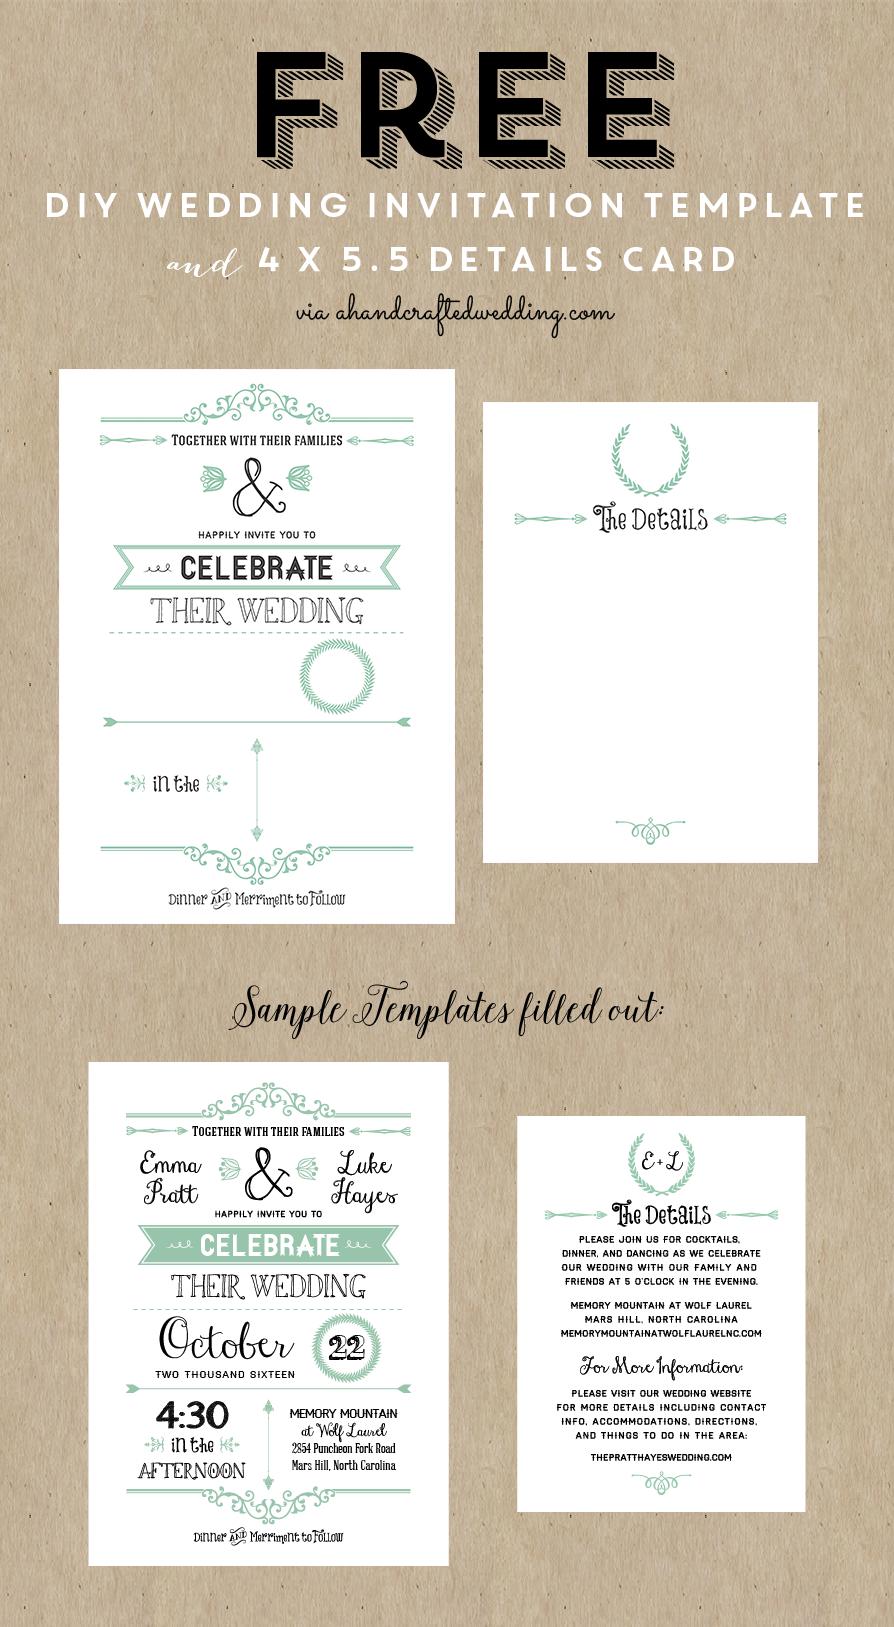 Free Printable Wedding Invitation Template   Wedding   Free Wedding - Free Printable Wedding Invitation Templates